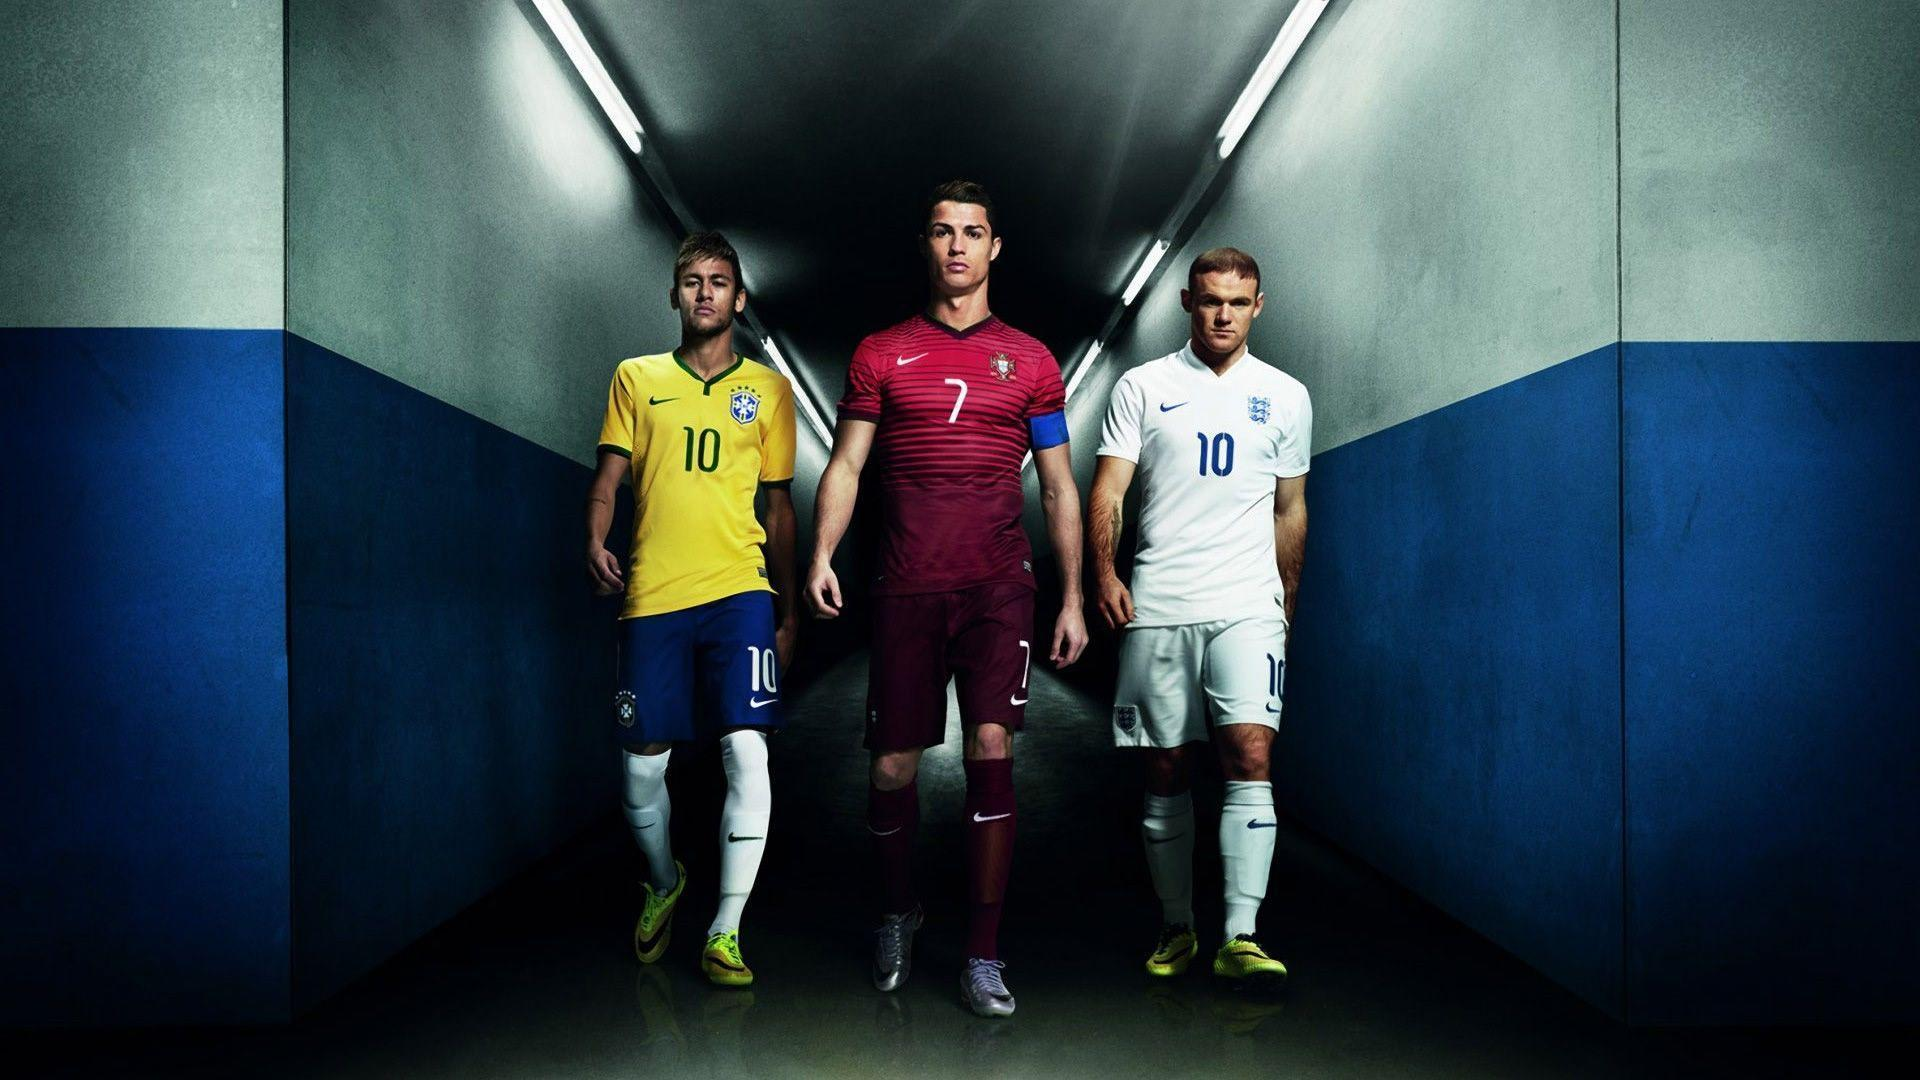 Cristiano Ronaldo Nike Wallpapers Wallpaper Cave